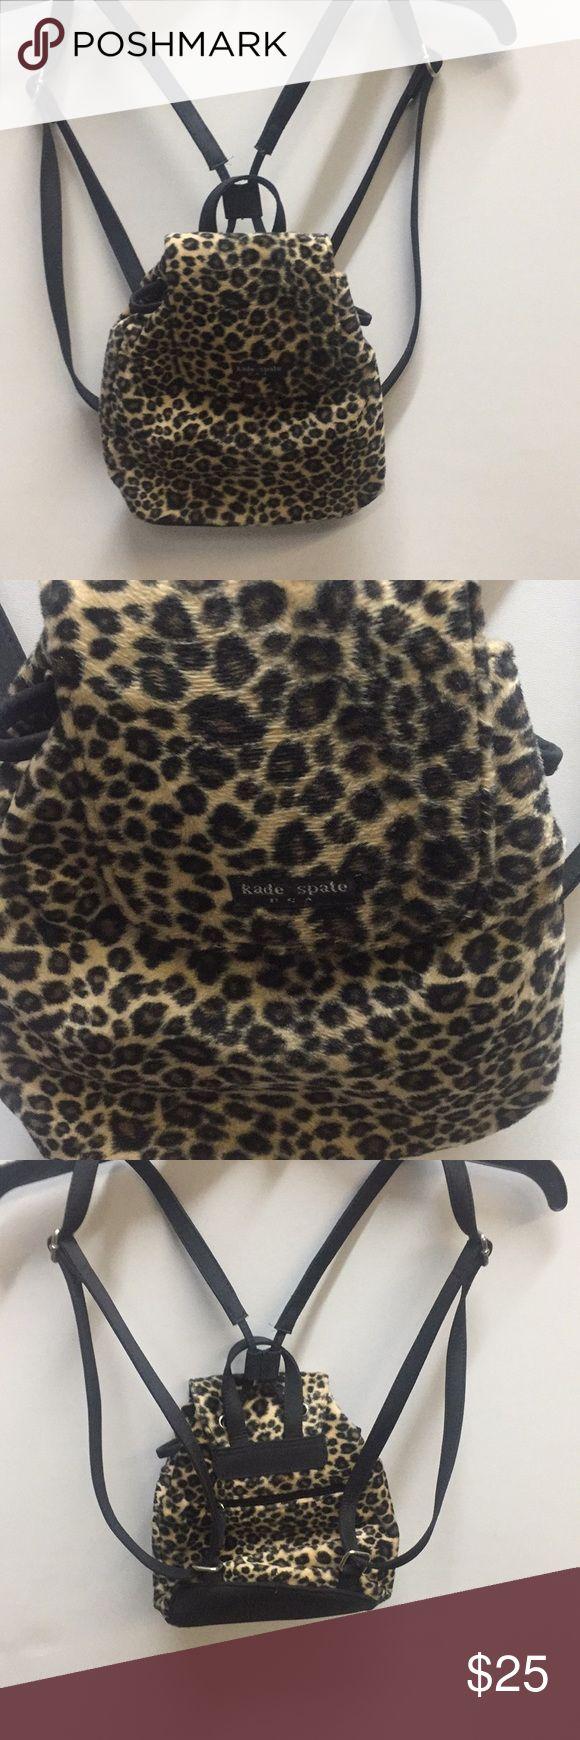 Leopard Print Kate spate Backpack Purse. Leopard print backpack with a small zipper pocket inside. kate Spate Bags Backpacks